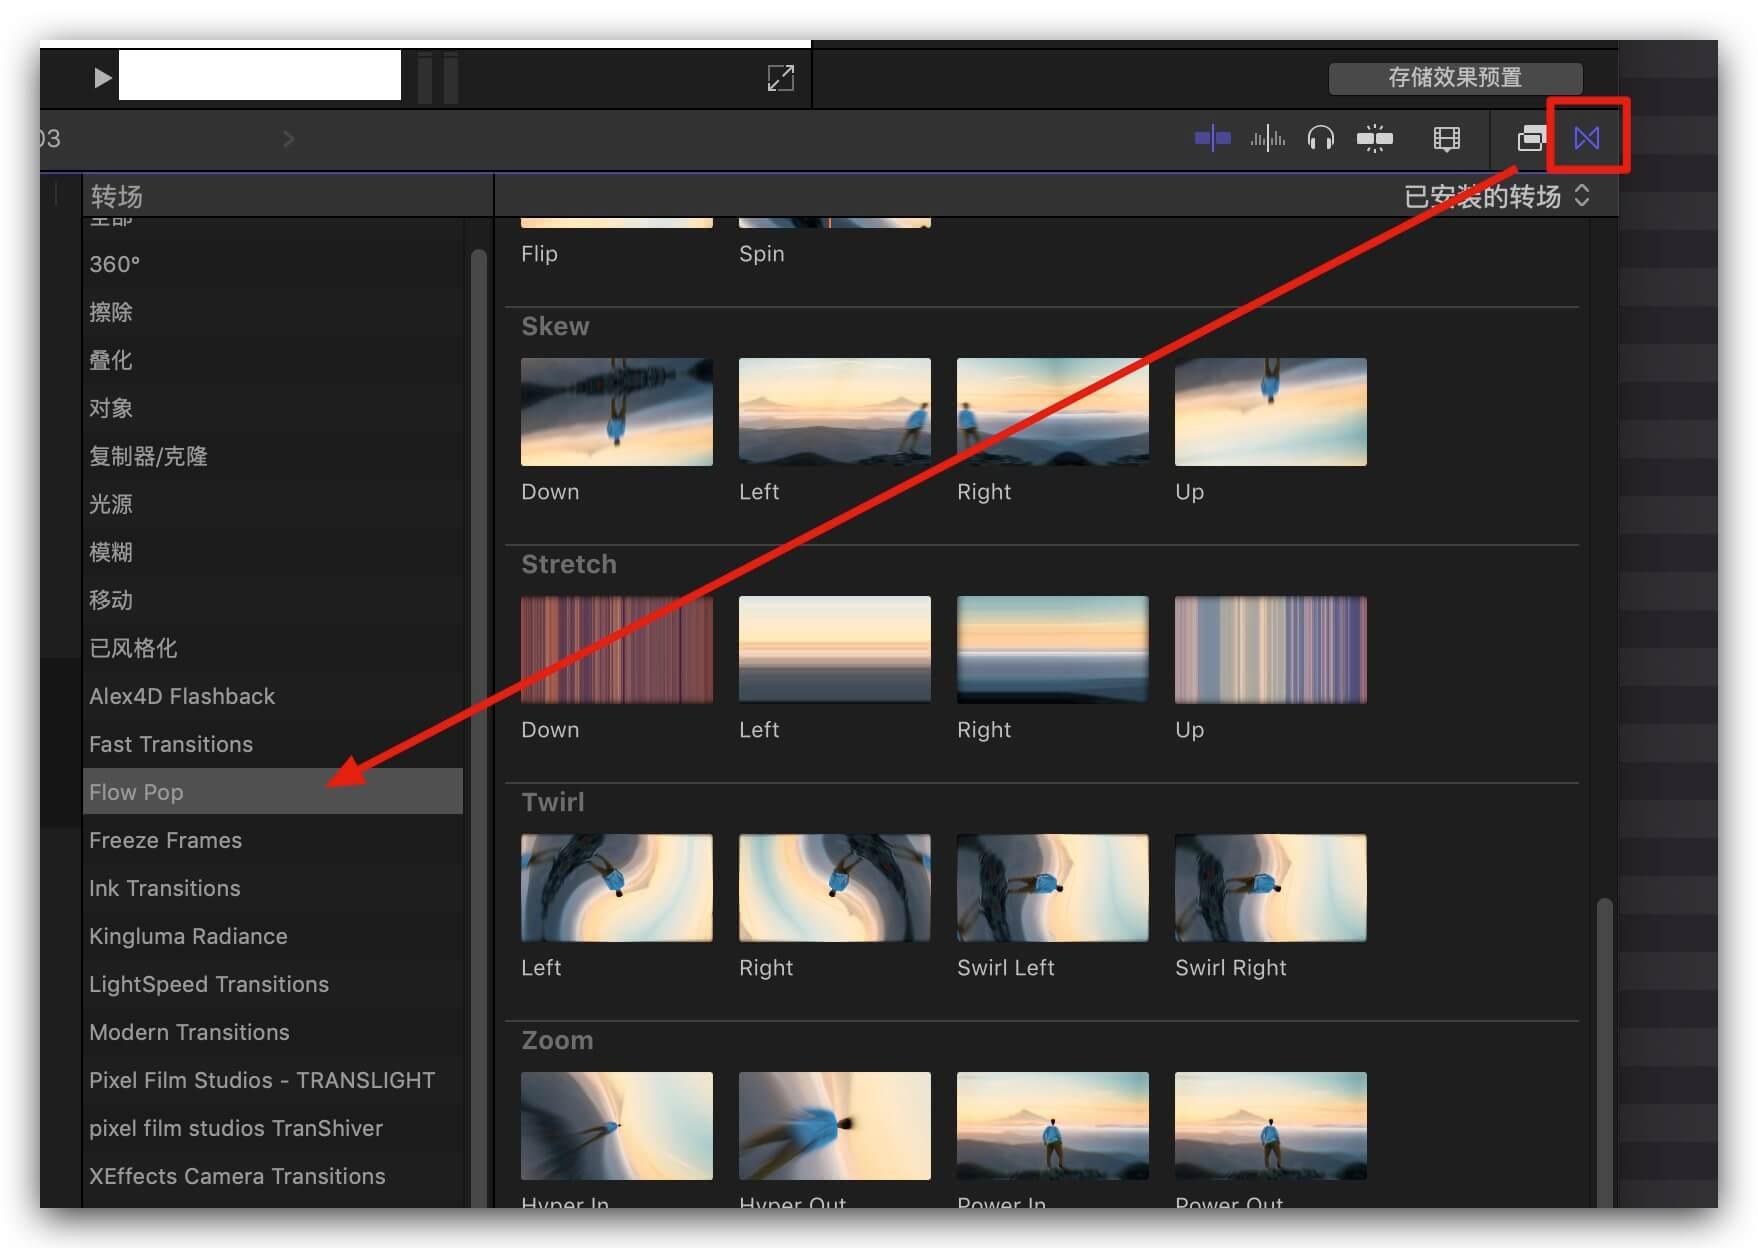 Fcpx转场插件 48组镜头弹跳平滑鱼眼干扰透视旋转缩放全景效果过渡 Flow Pop